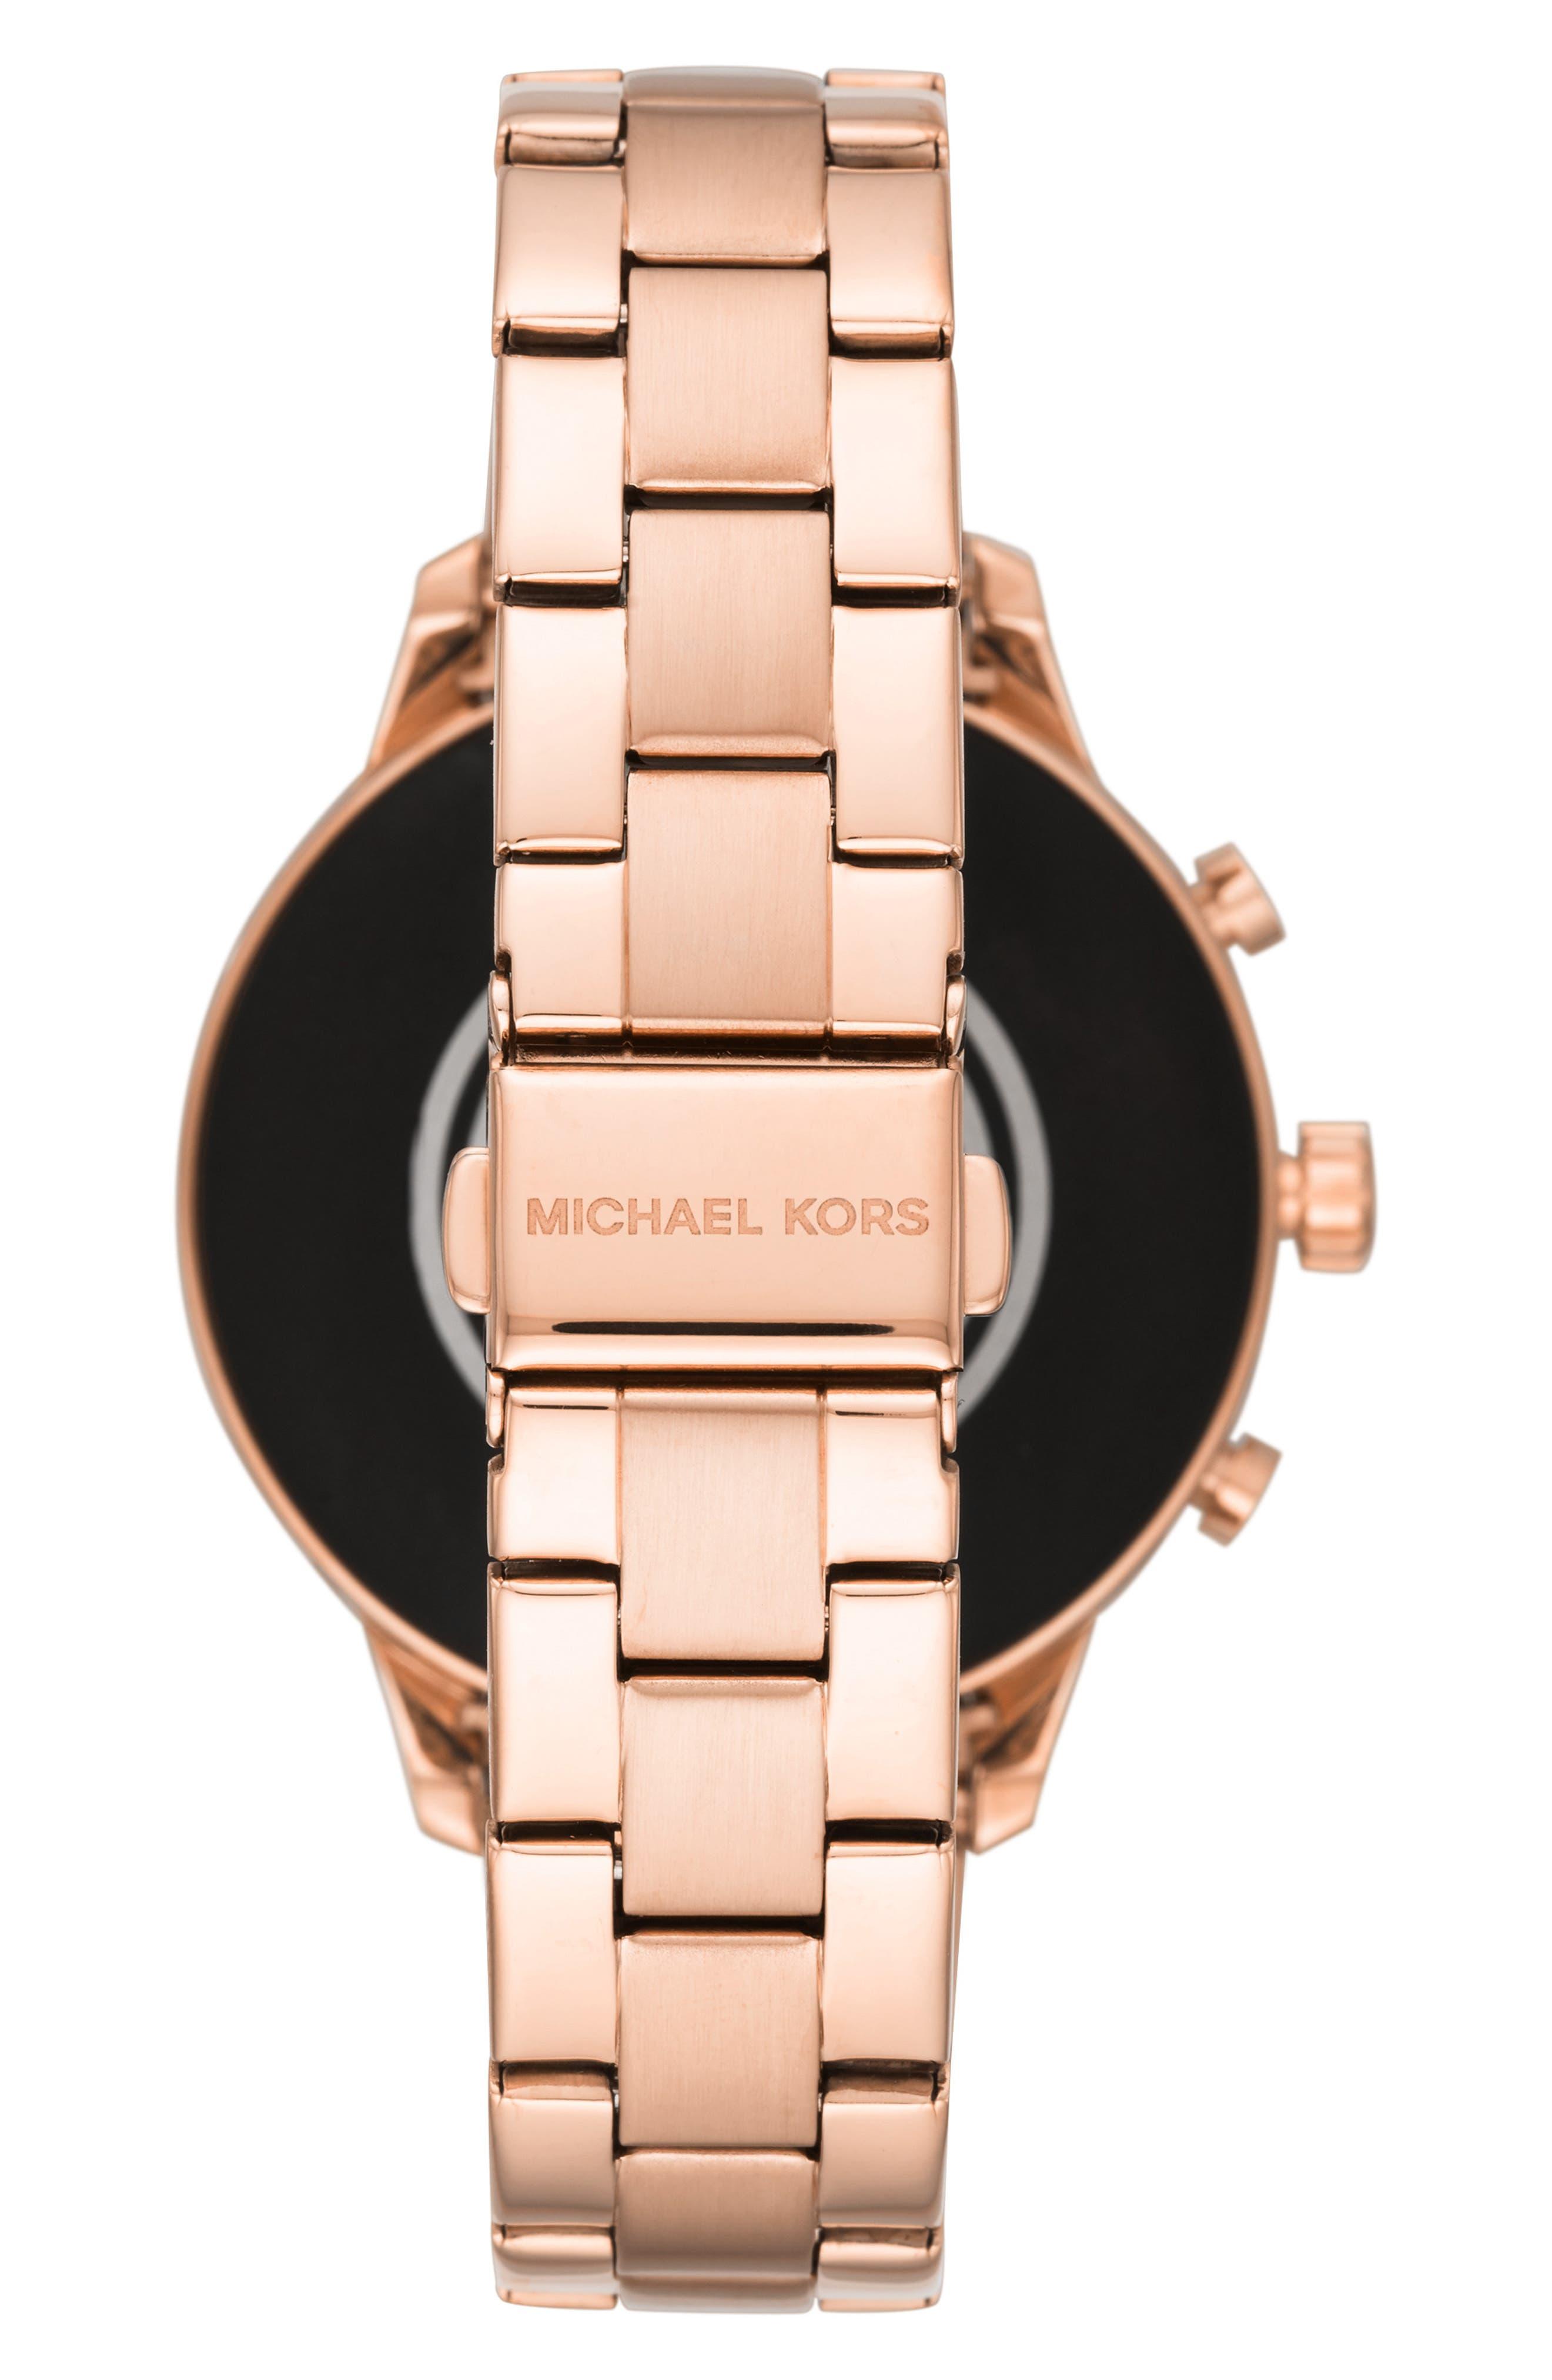 MICHAEL KORS, MICHAEL Michael Kors Access Runway Smart Bracelet Watch, 41mm, Alternate thumbnail 2, color, ROSE GOLD